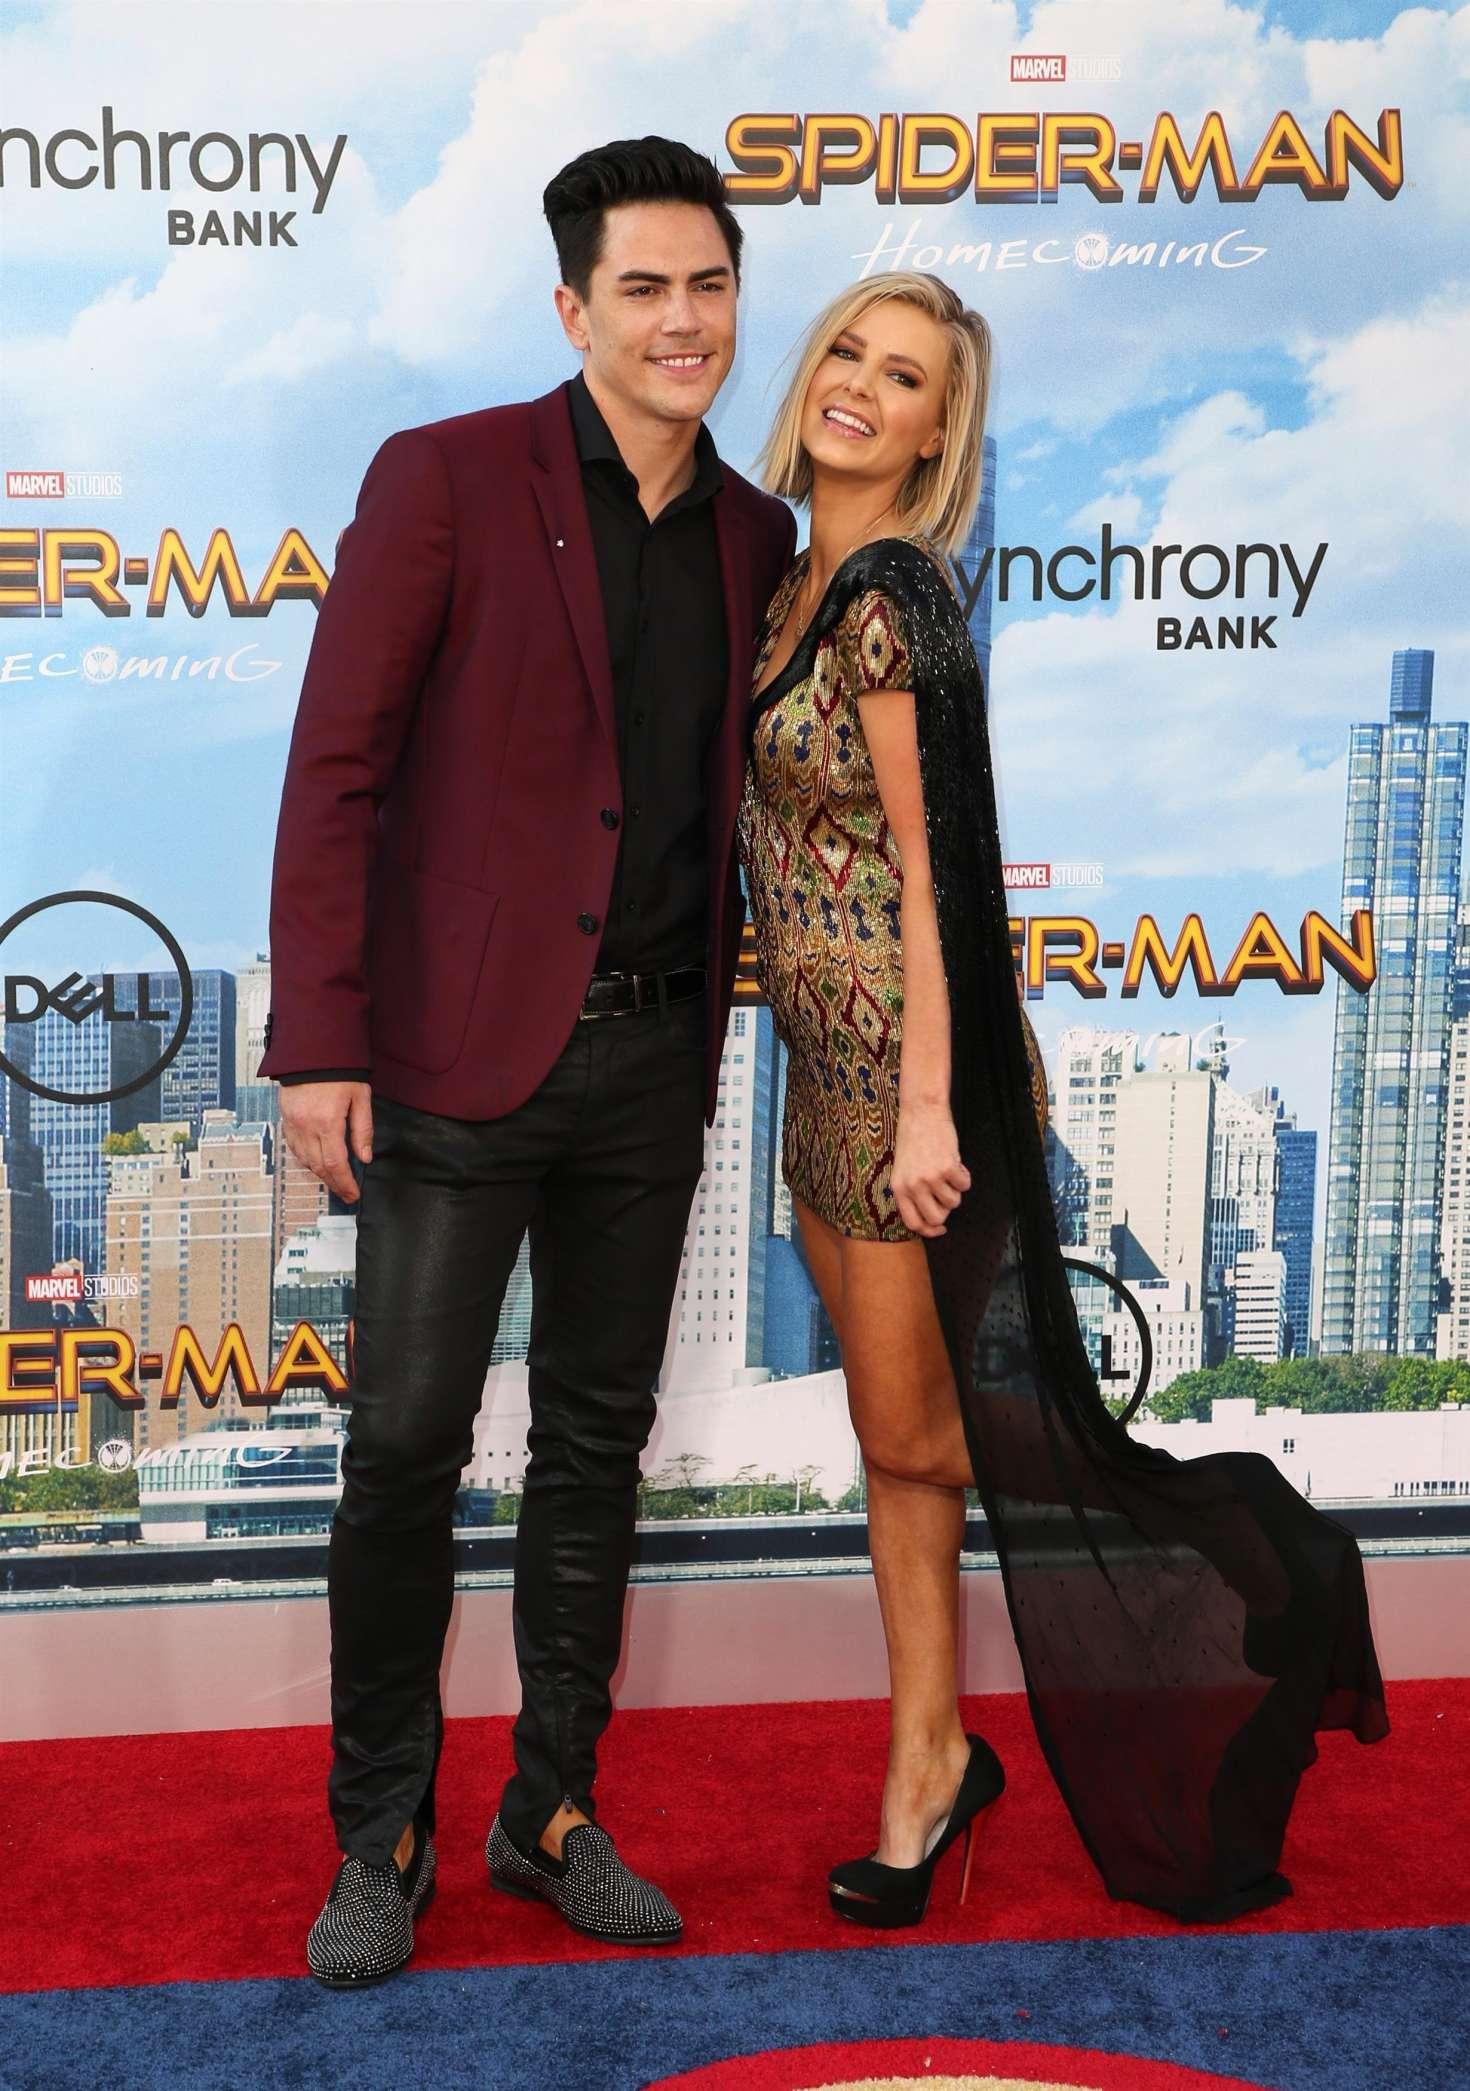 Ariana Madix 2017 : Ariana Madix: Spider-Man: Homecoming Premiere in Hollywood -07